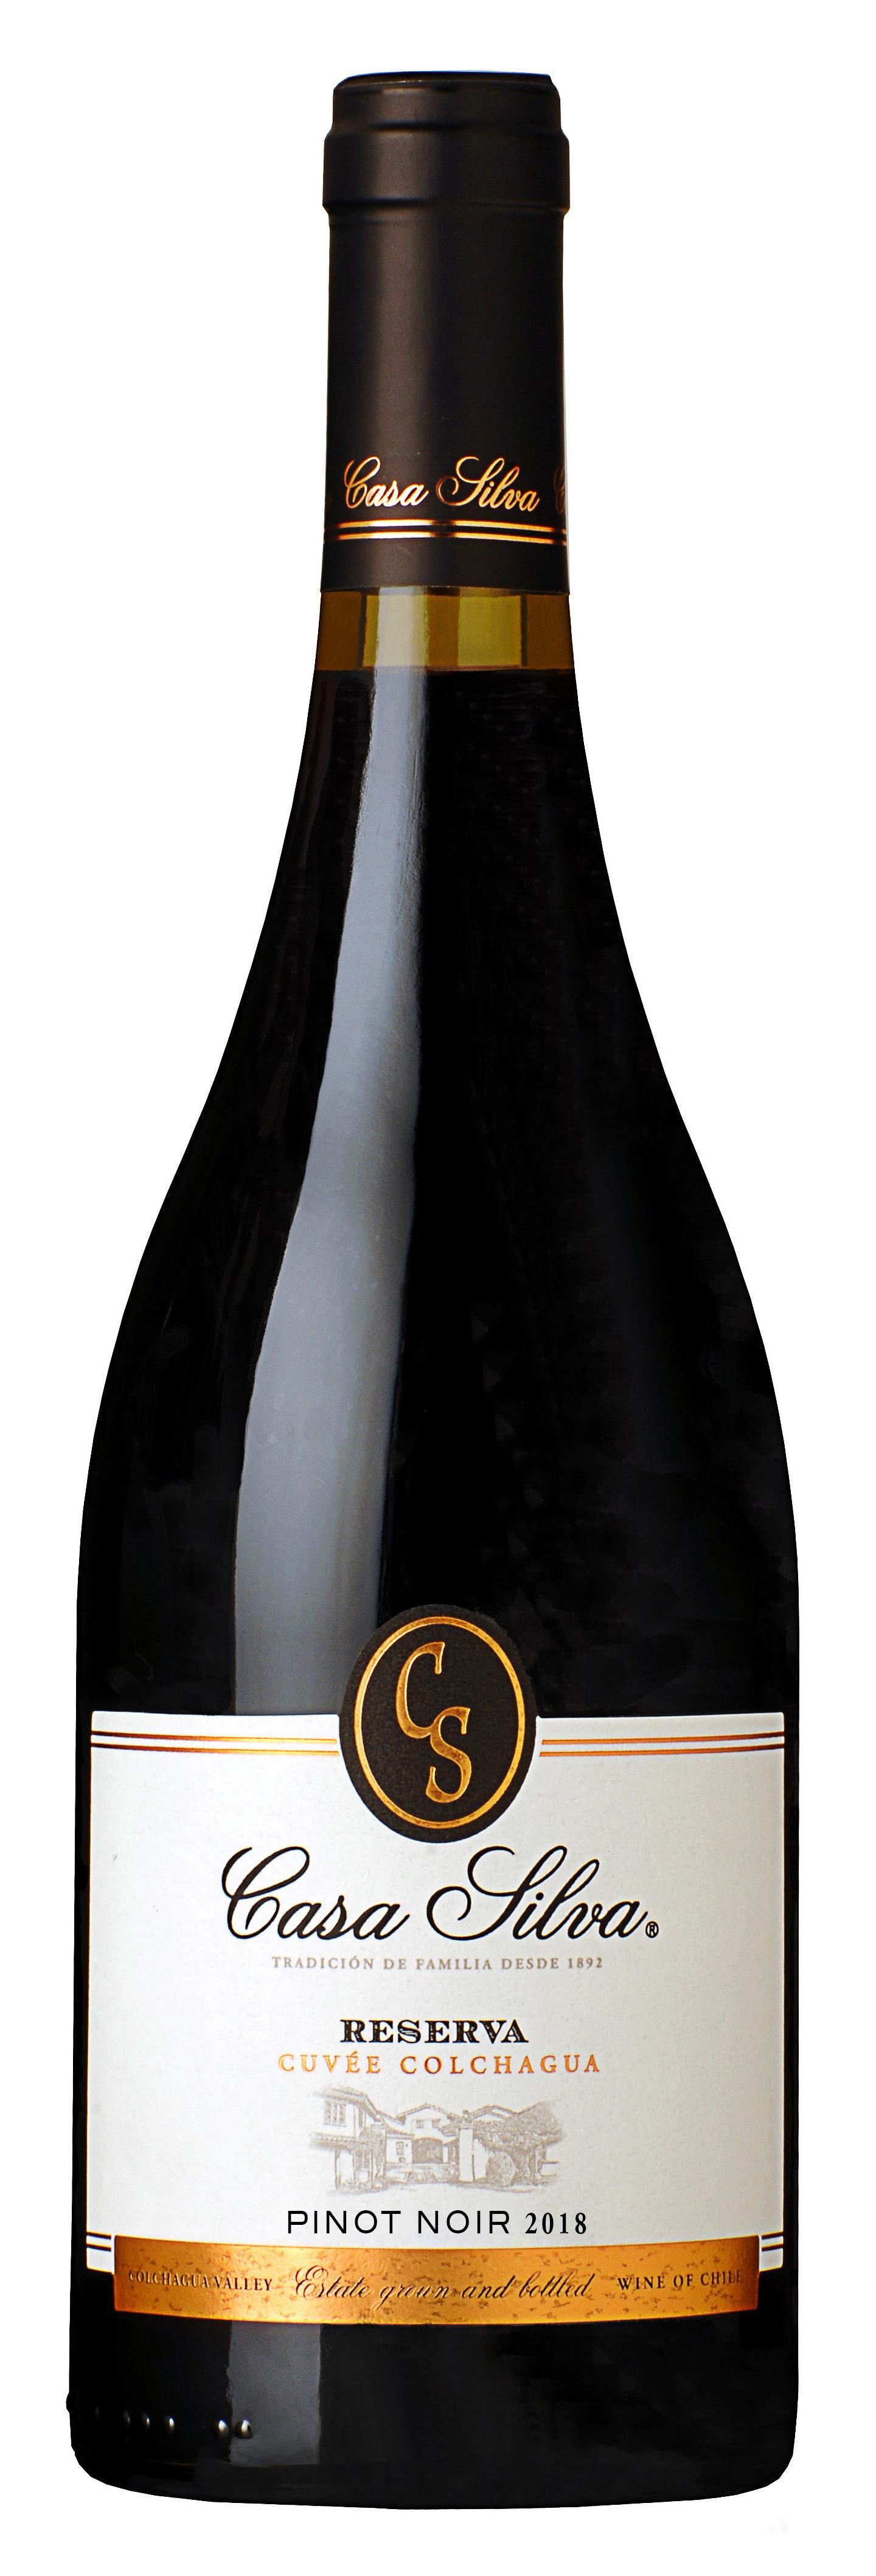 Cuvee Colchagua Reserva Pinot Noir